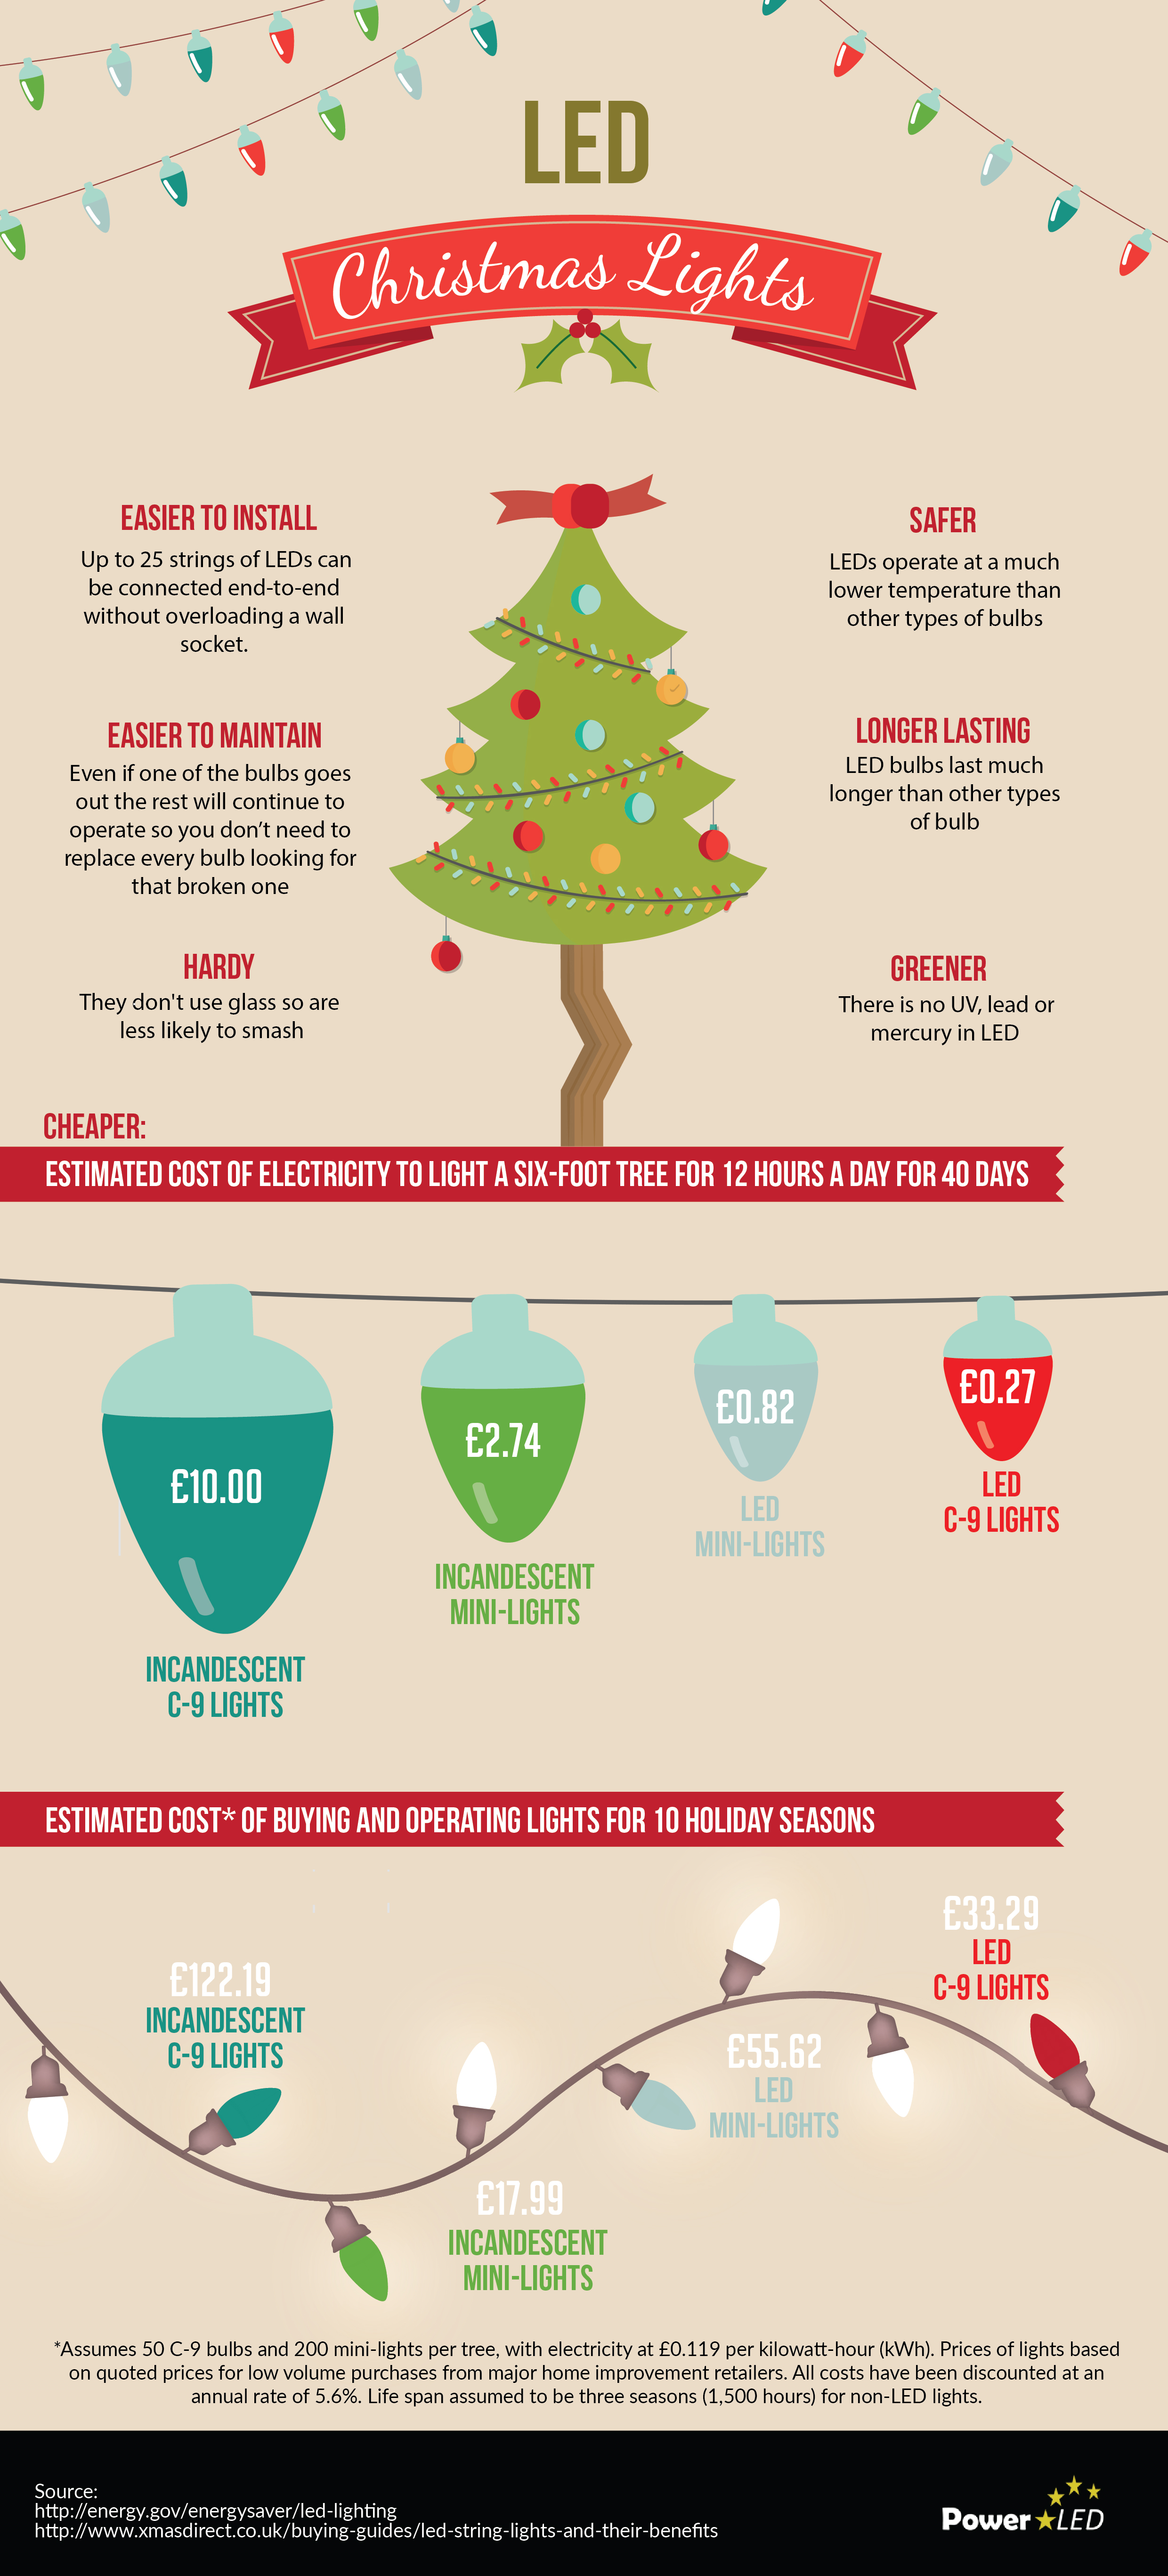 How Many Lights Per Foot Of Christmas Tree.Led Christmas Lights Power Led Uk